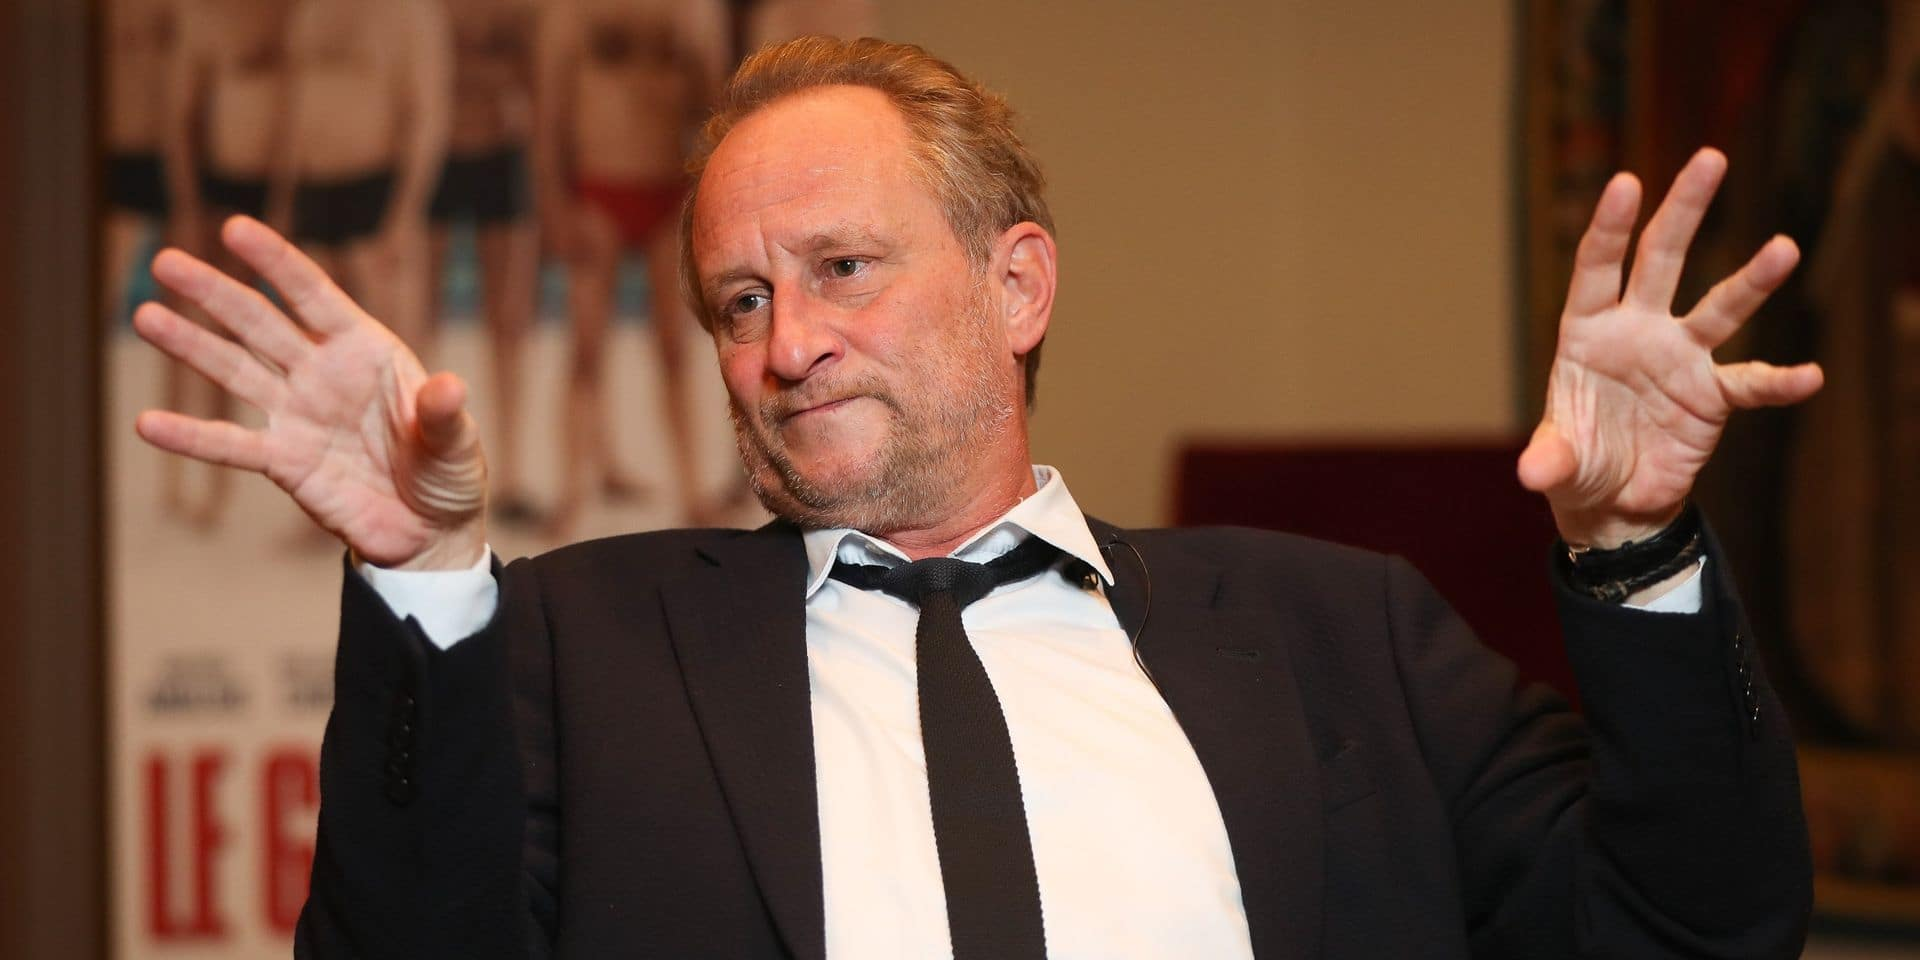 Benoît Poelvoorde, Virginie Efira, François Damiens, Cécile de France,... : 2021, l'année du cinéma belge !